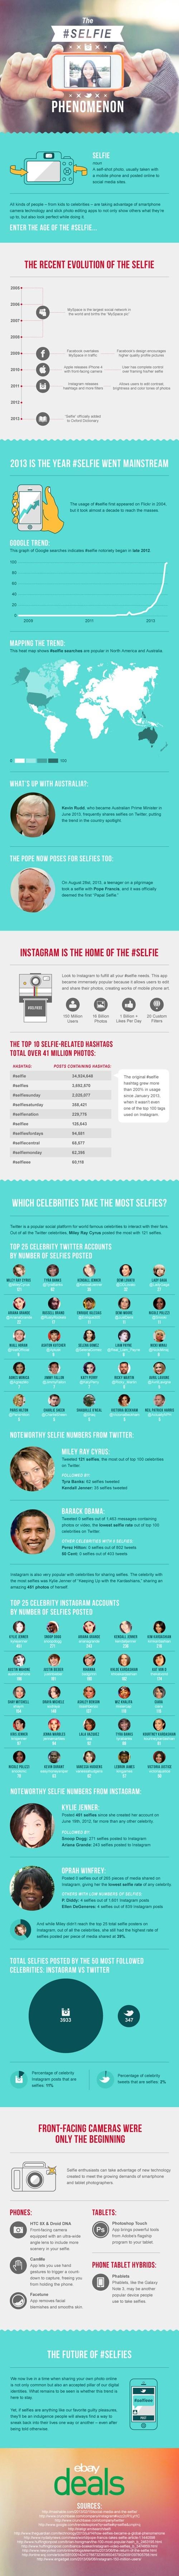 selfie,cameras,infographic